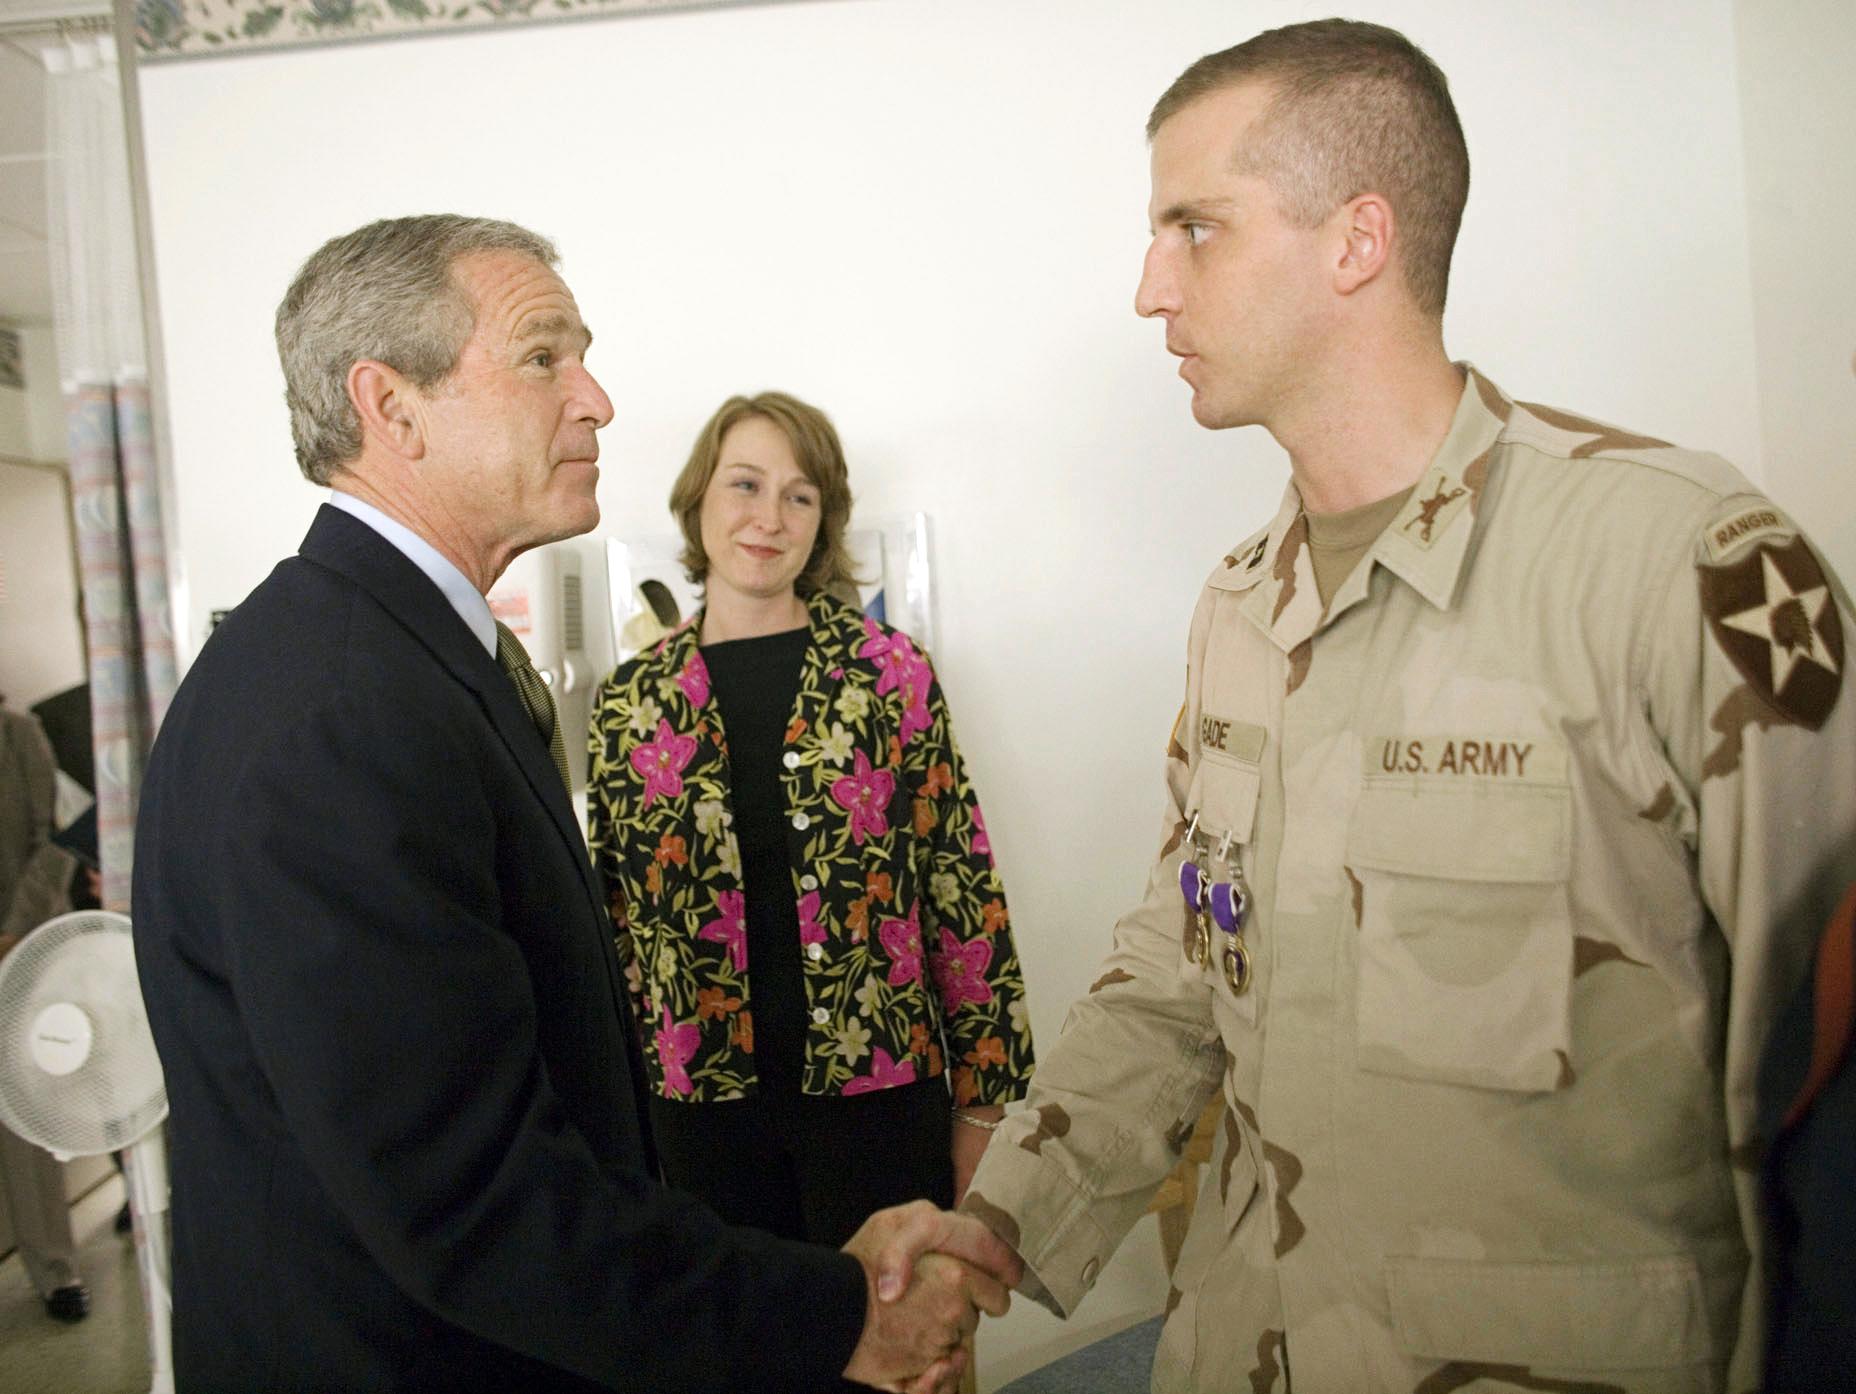 Image: President George W. Bush shakes the Capt. Daniel Gade